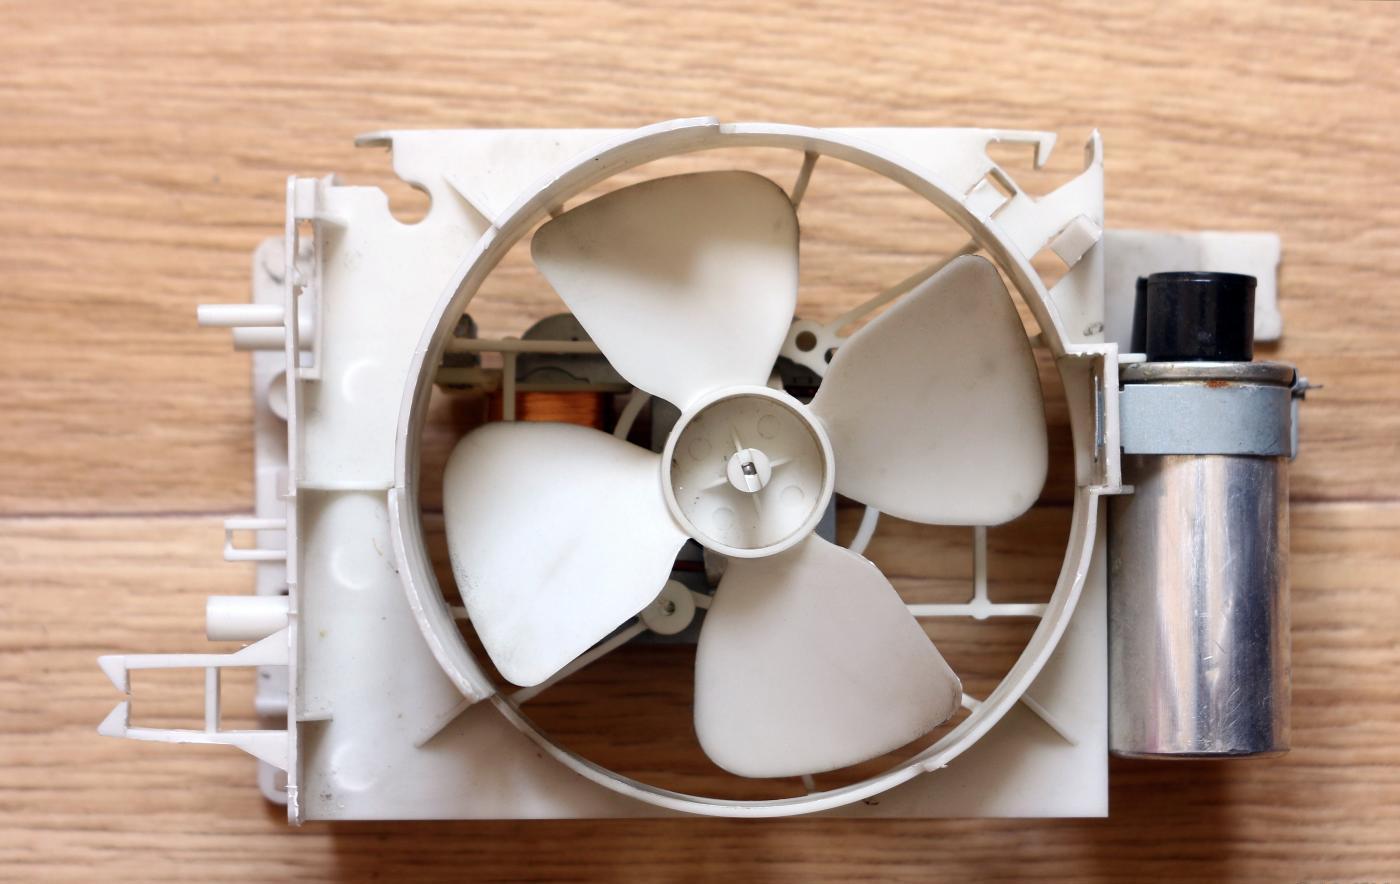 вентилятор микроволновки